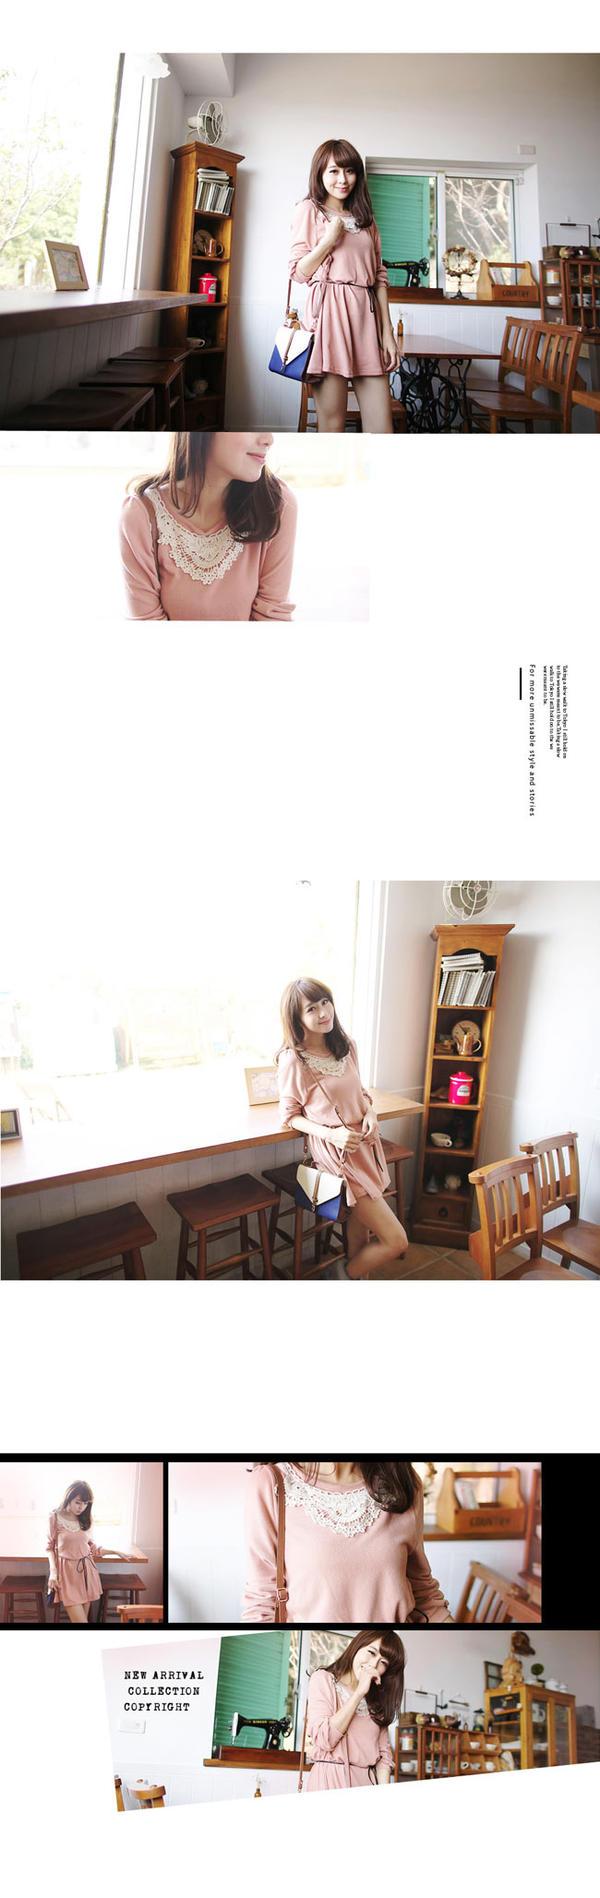 Crochet-Collar A-Line Dress - Tokyo Fashion | YESSTYLE